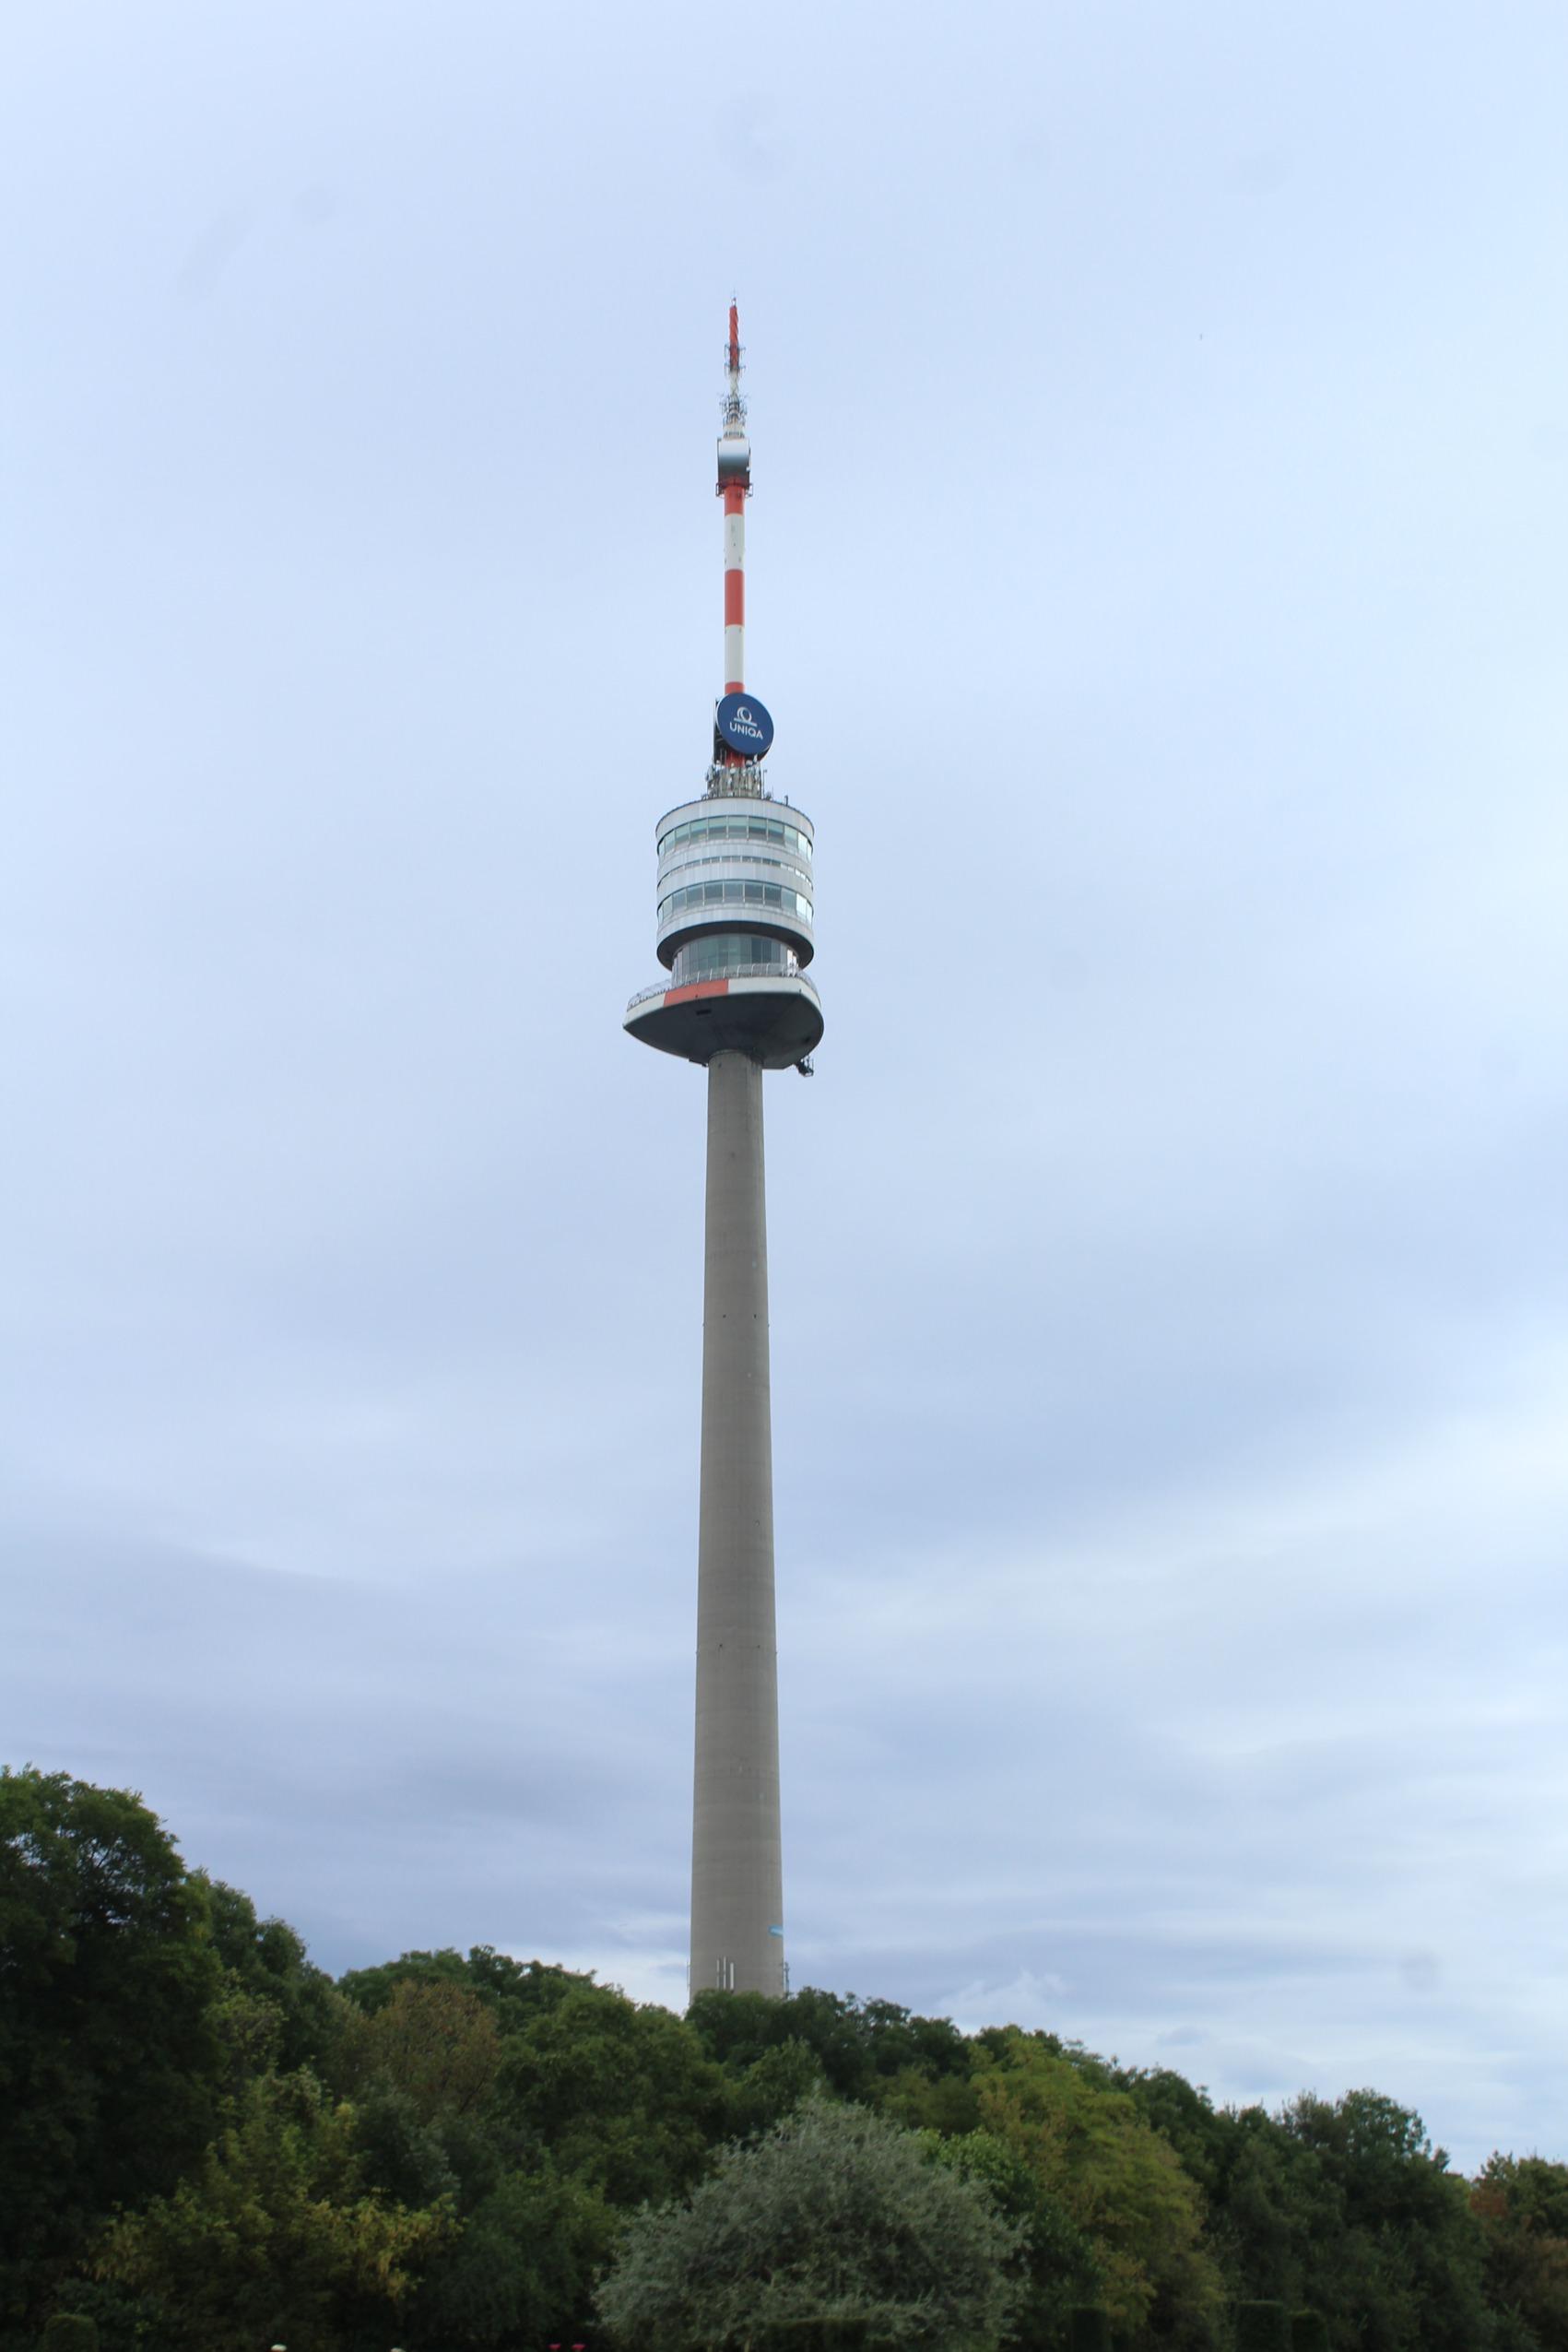 Wien-Donaustadt, Donaupark, der Donauturm-1.JPG